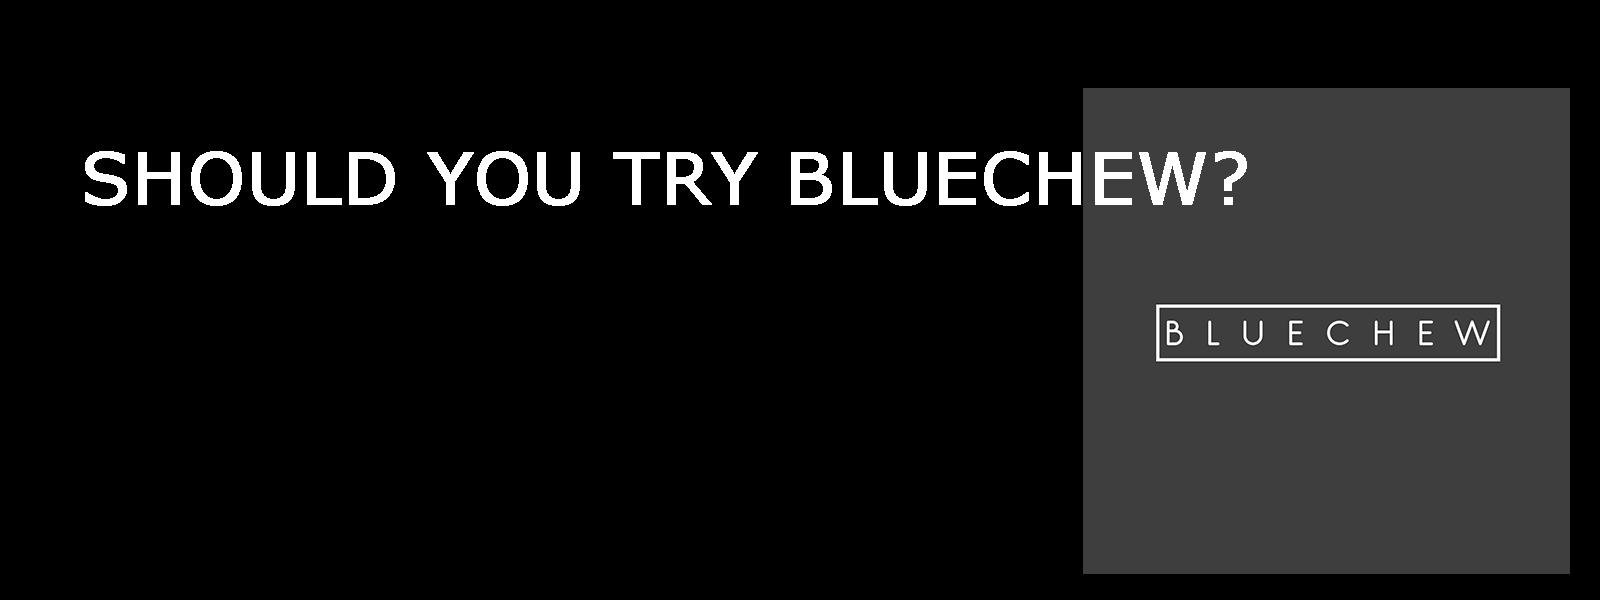 SHOULD YOU TRY BLUECHEW?